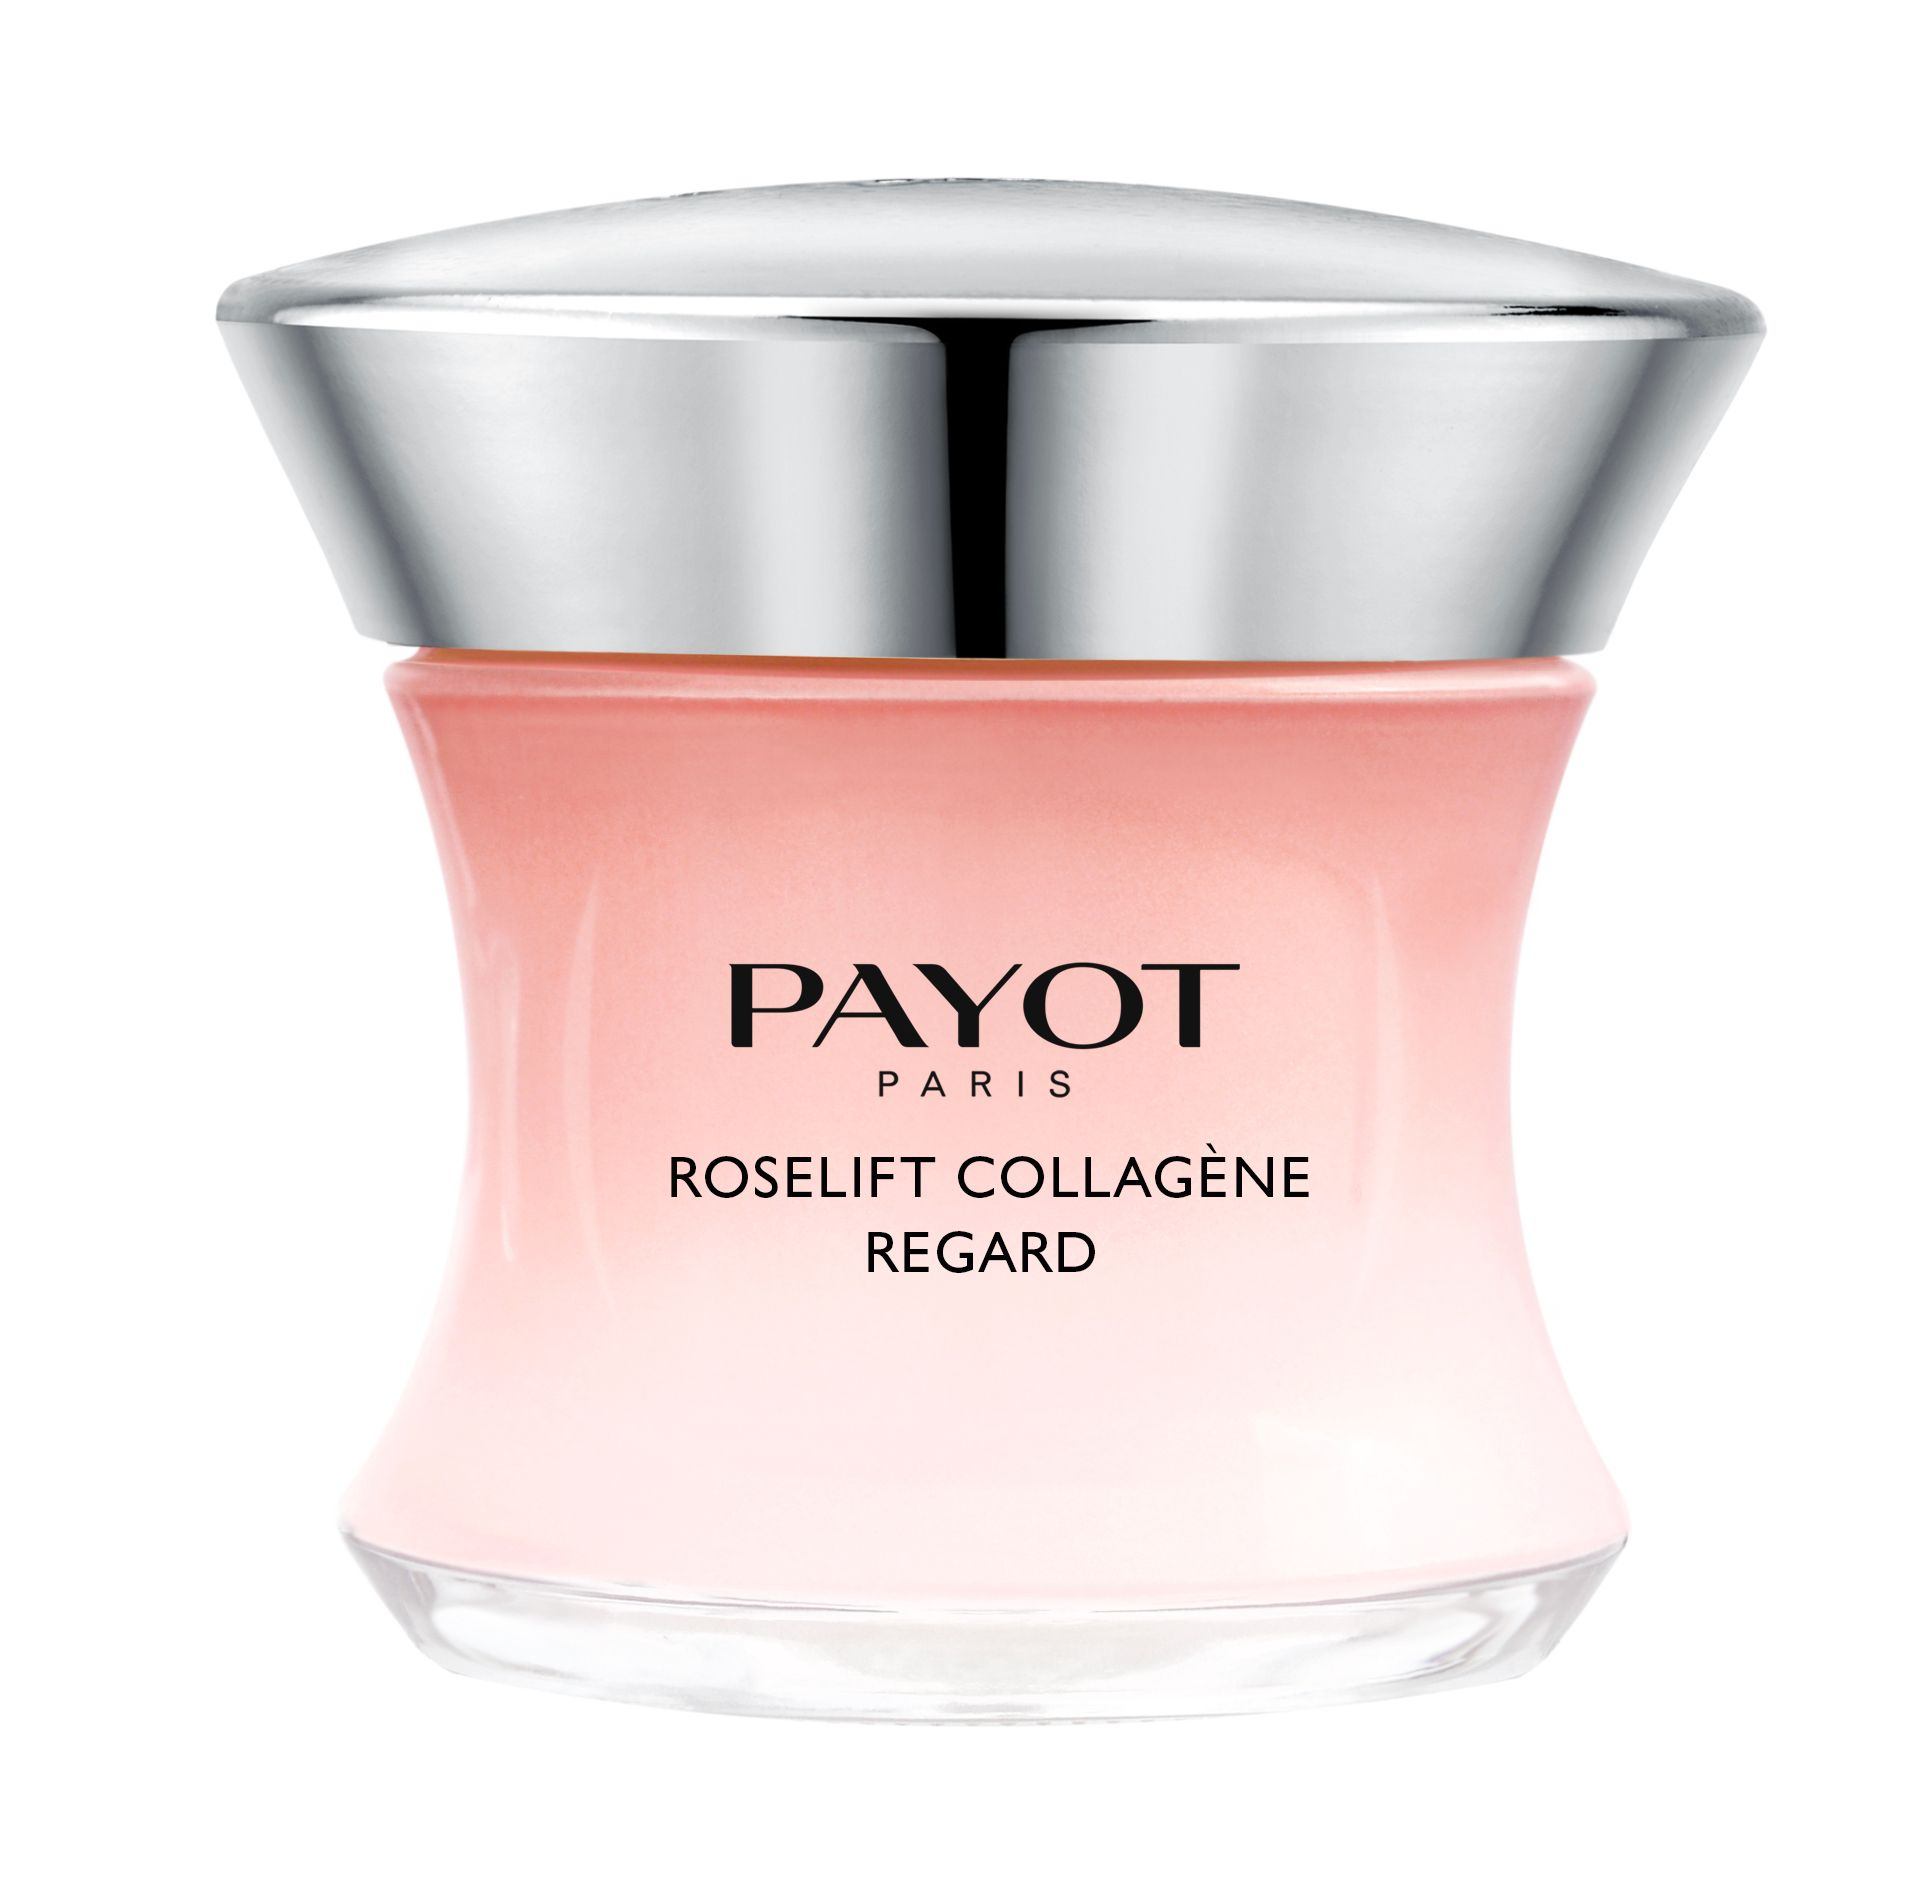 ROSELIFT_COLLAGENE_REGARD